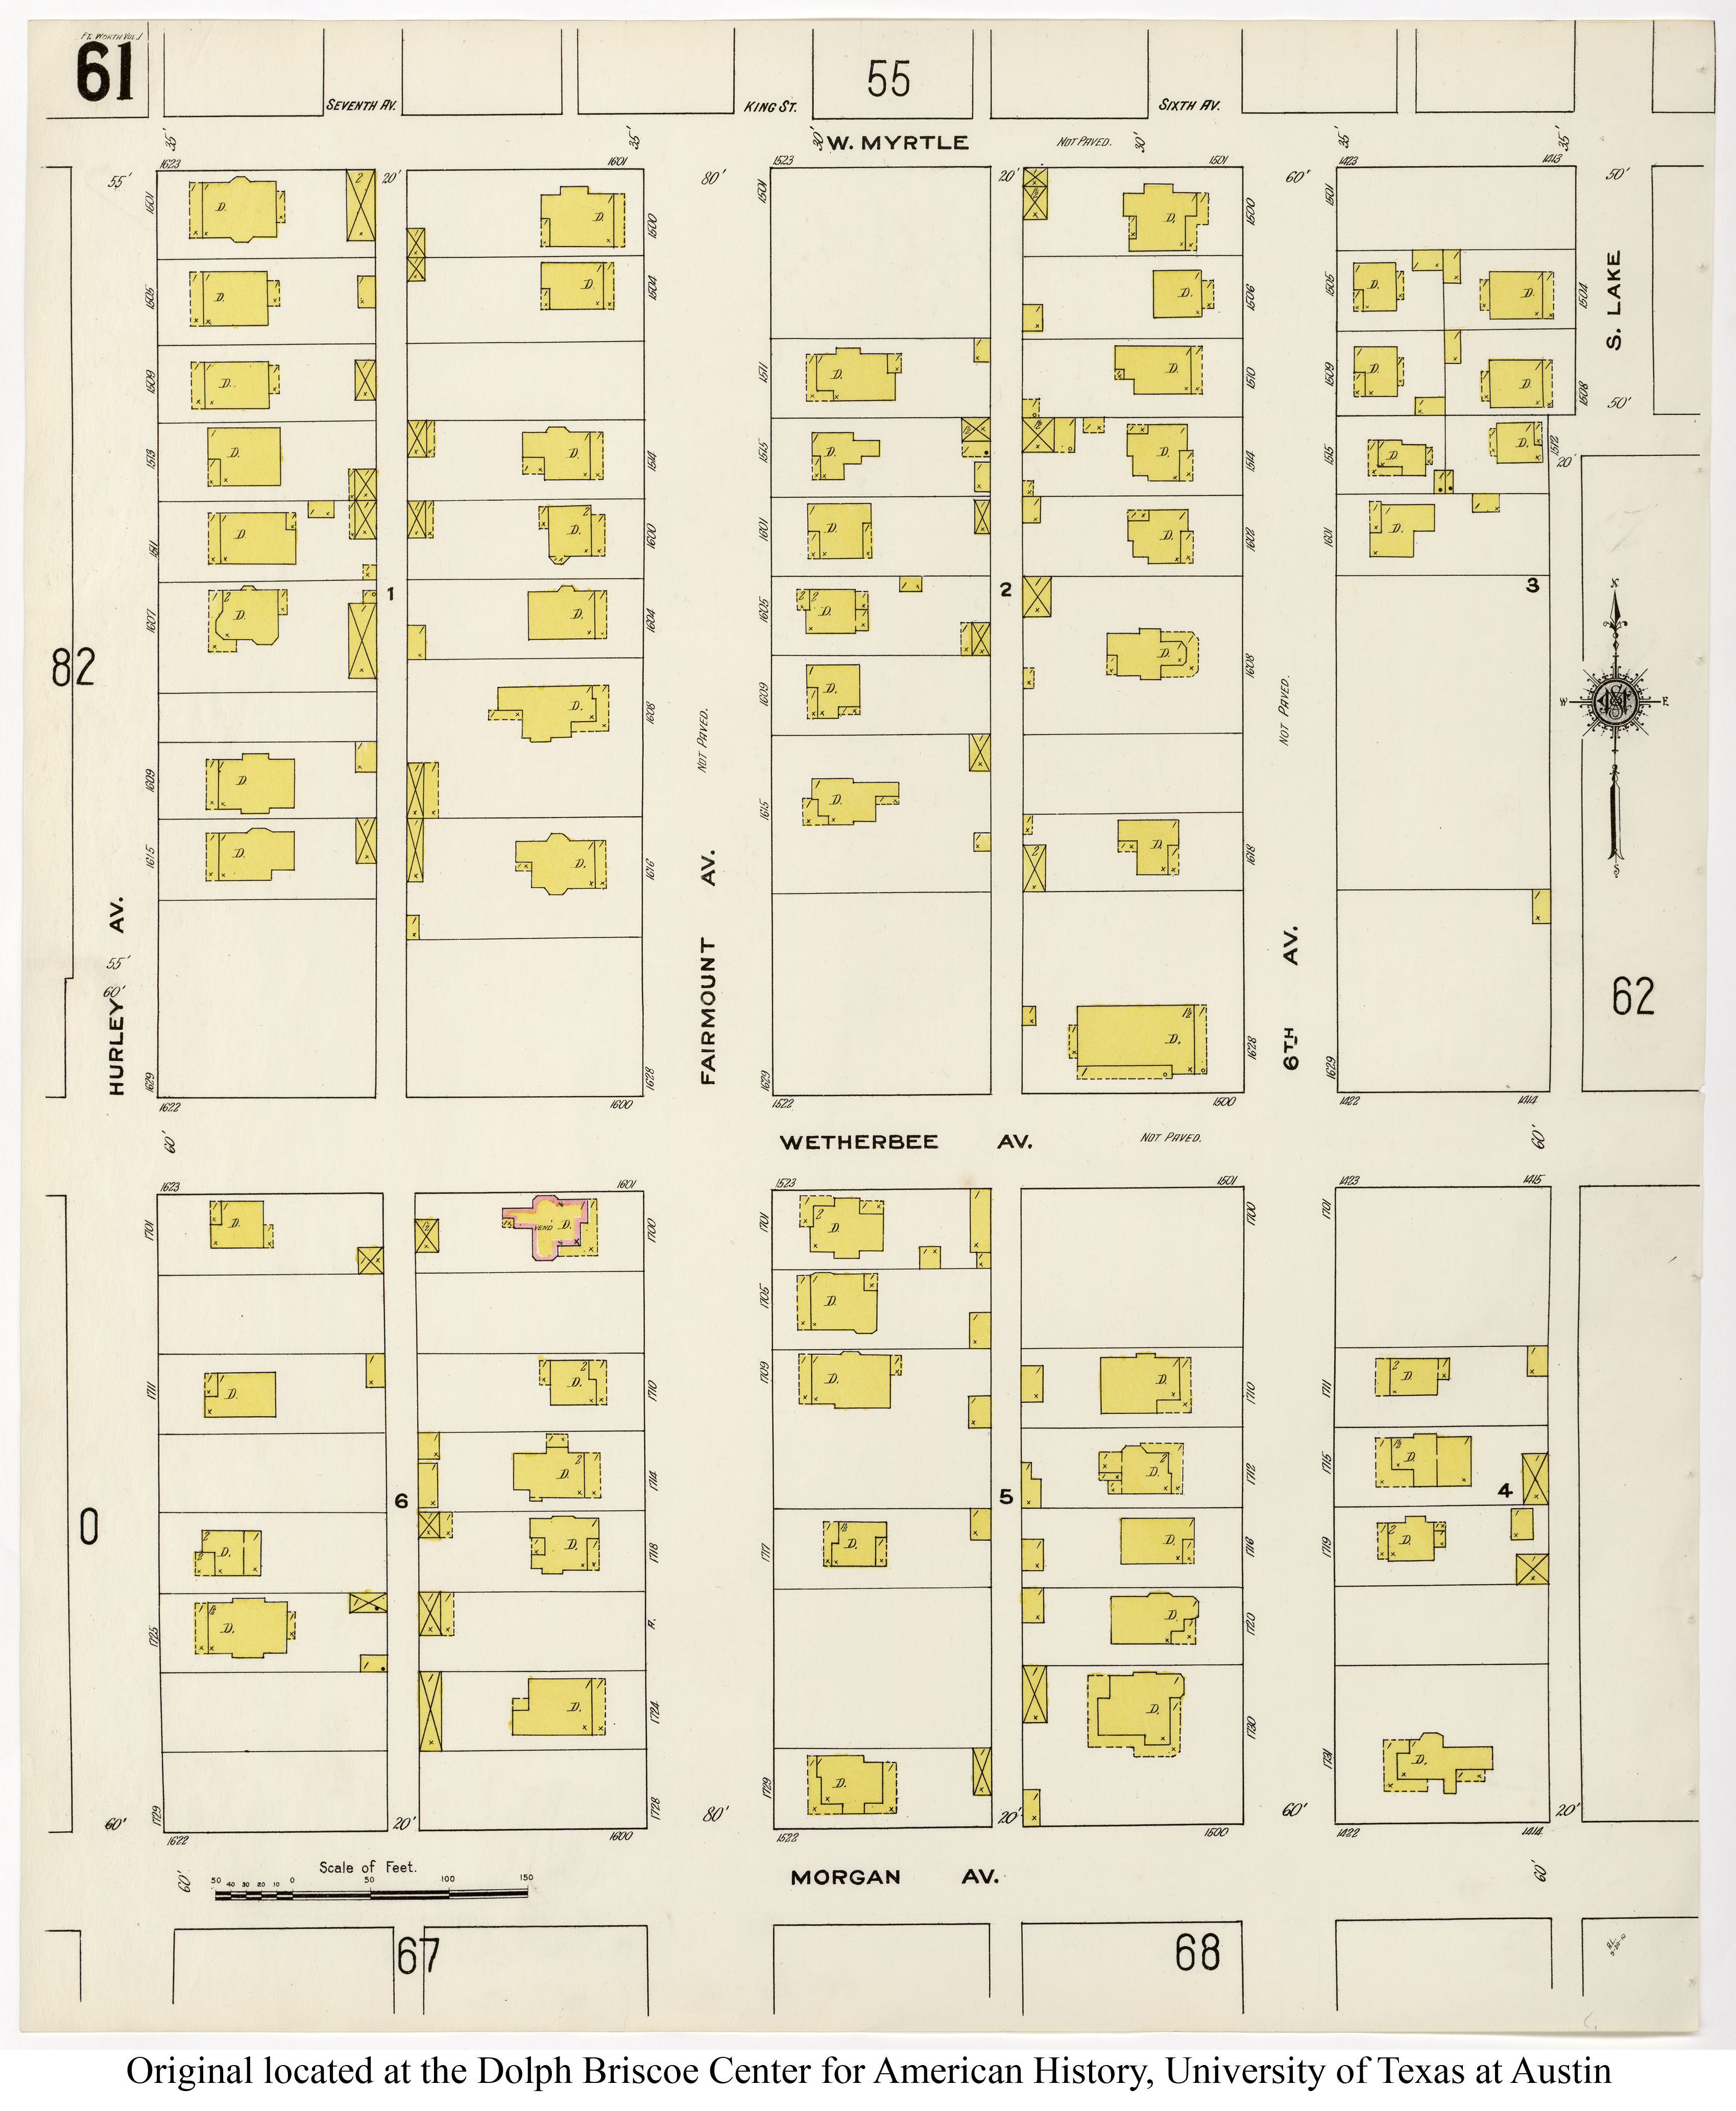 Sanborn Fire Maps For Fairmount Fairmount National Historic District